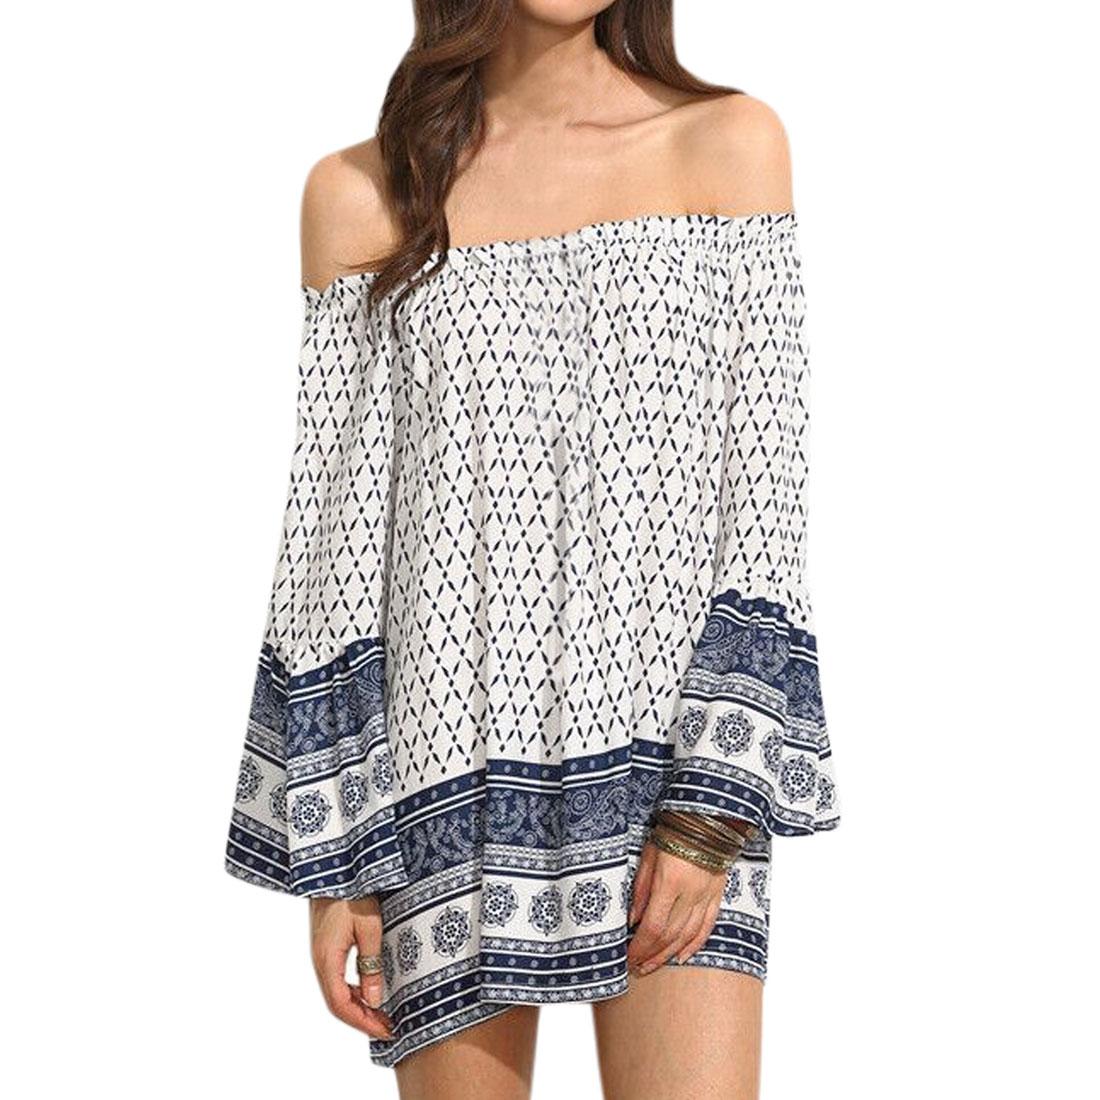 Women-Novelty-Prints-Off-Shoulder-Trumpet-Sleeves-Tunic-Dress